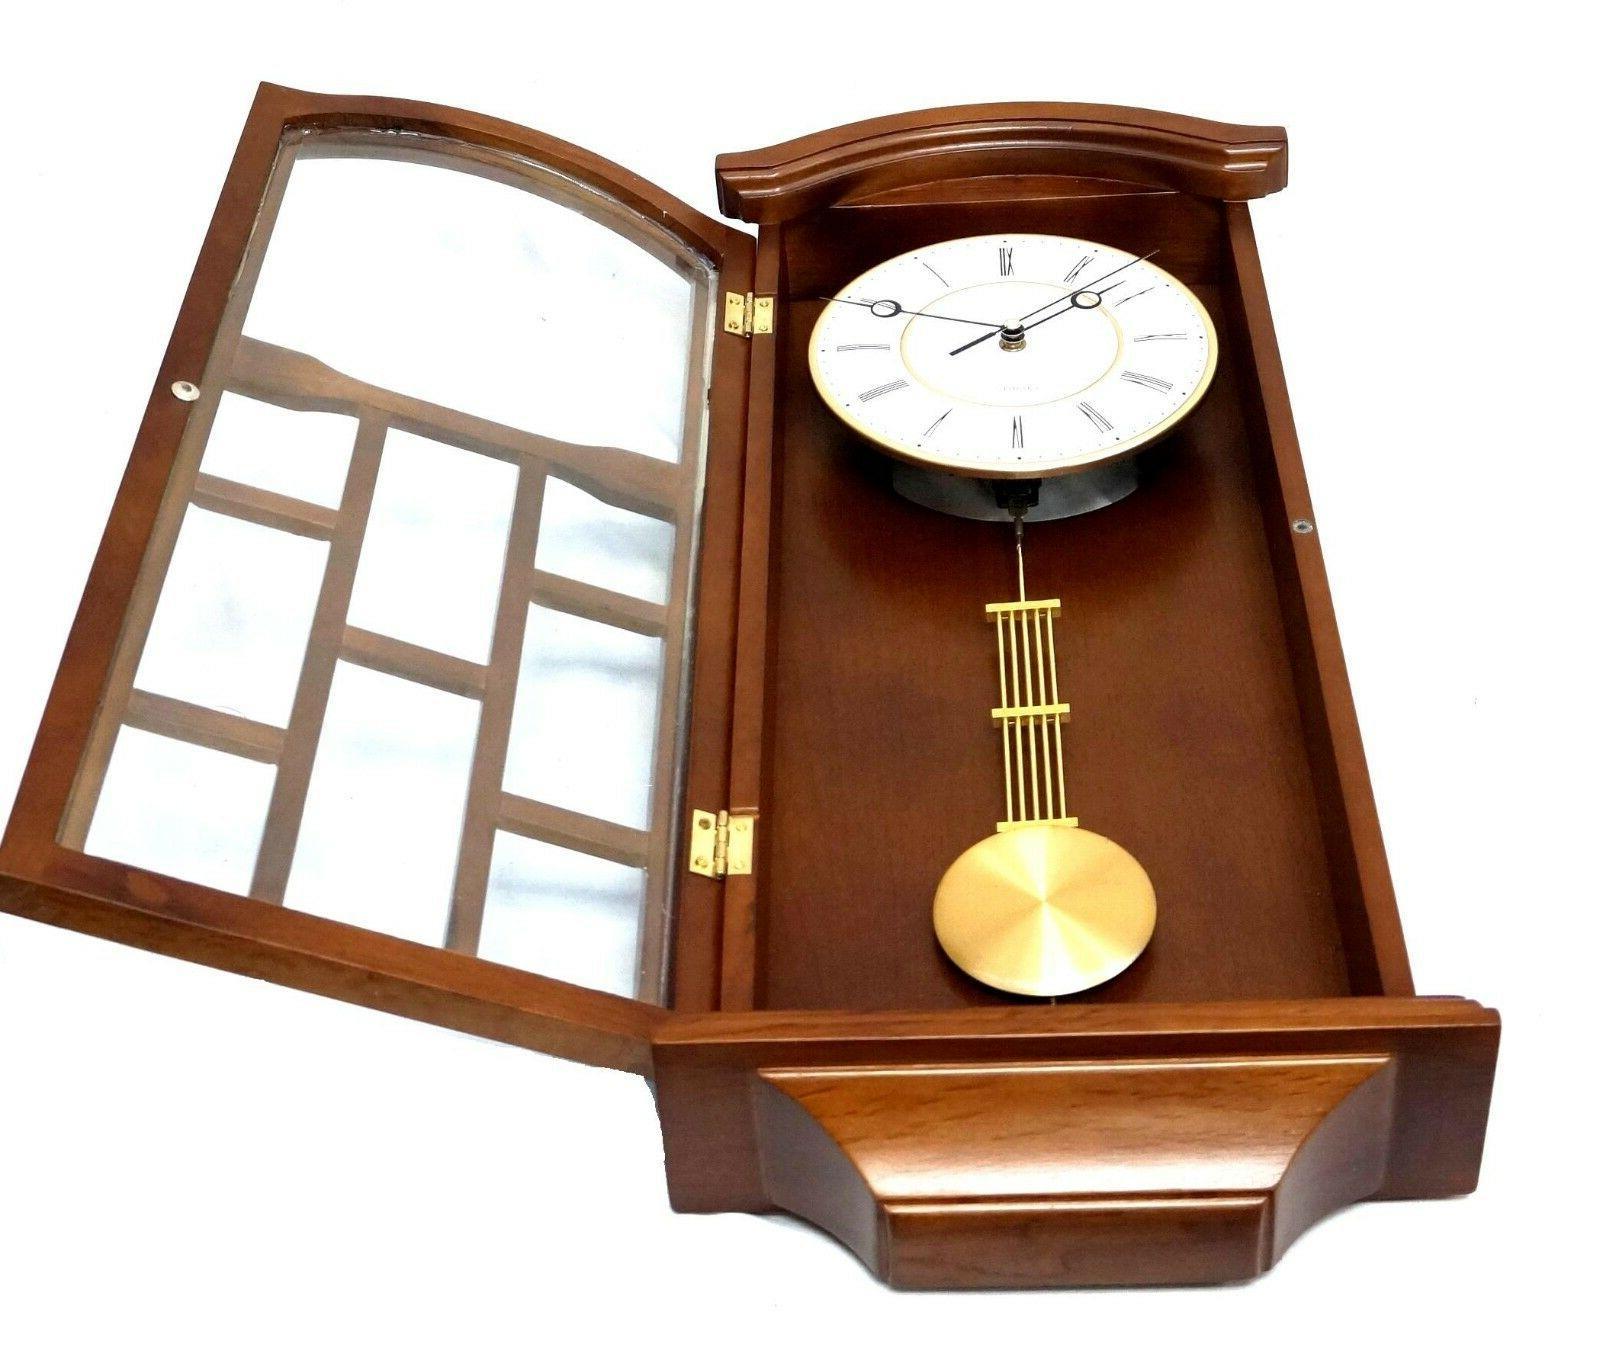 J&D Best Wall Clock retro vintage classic